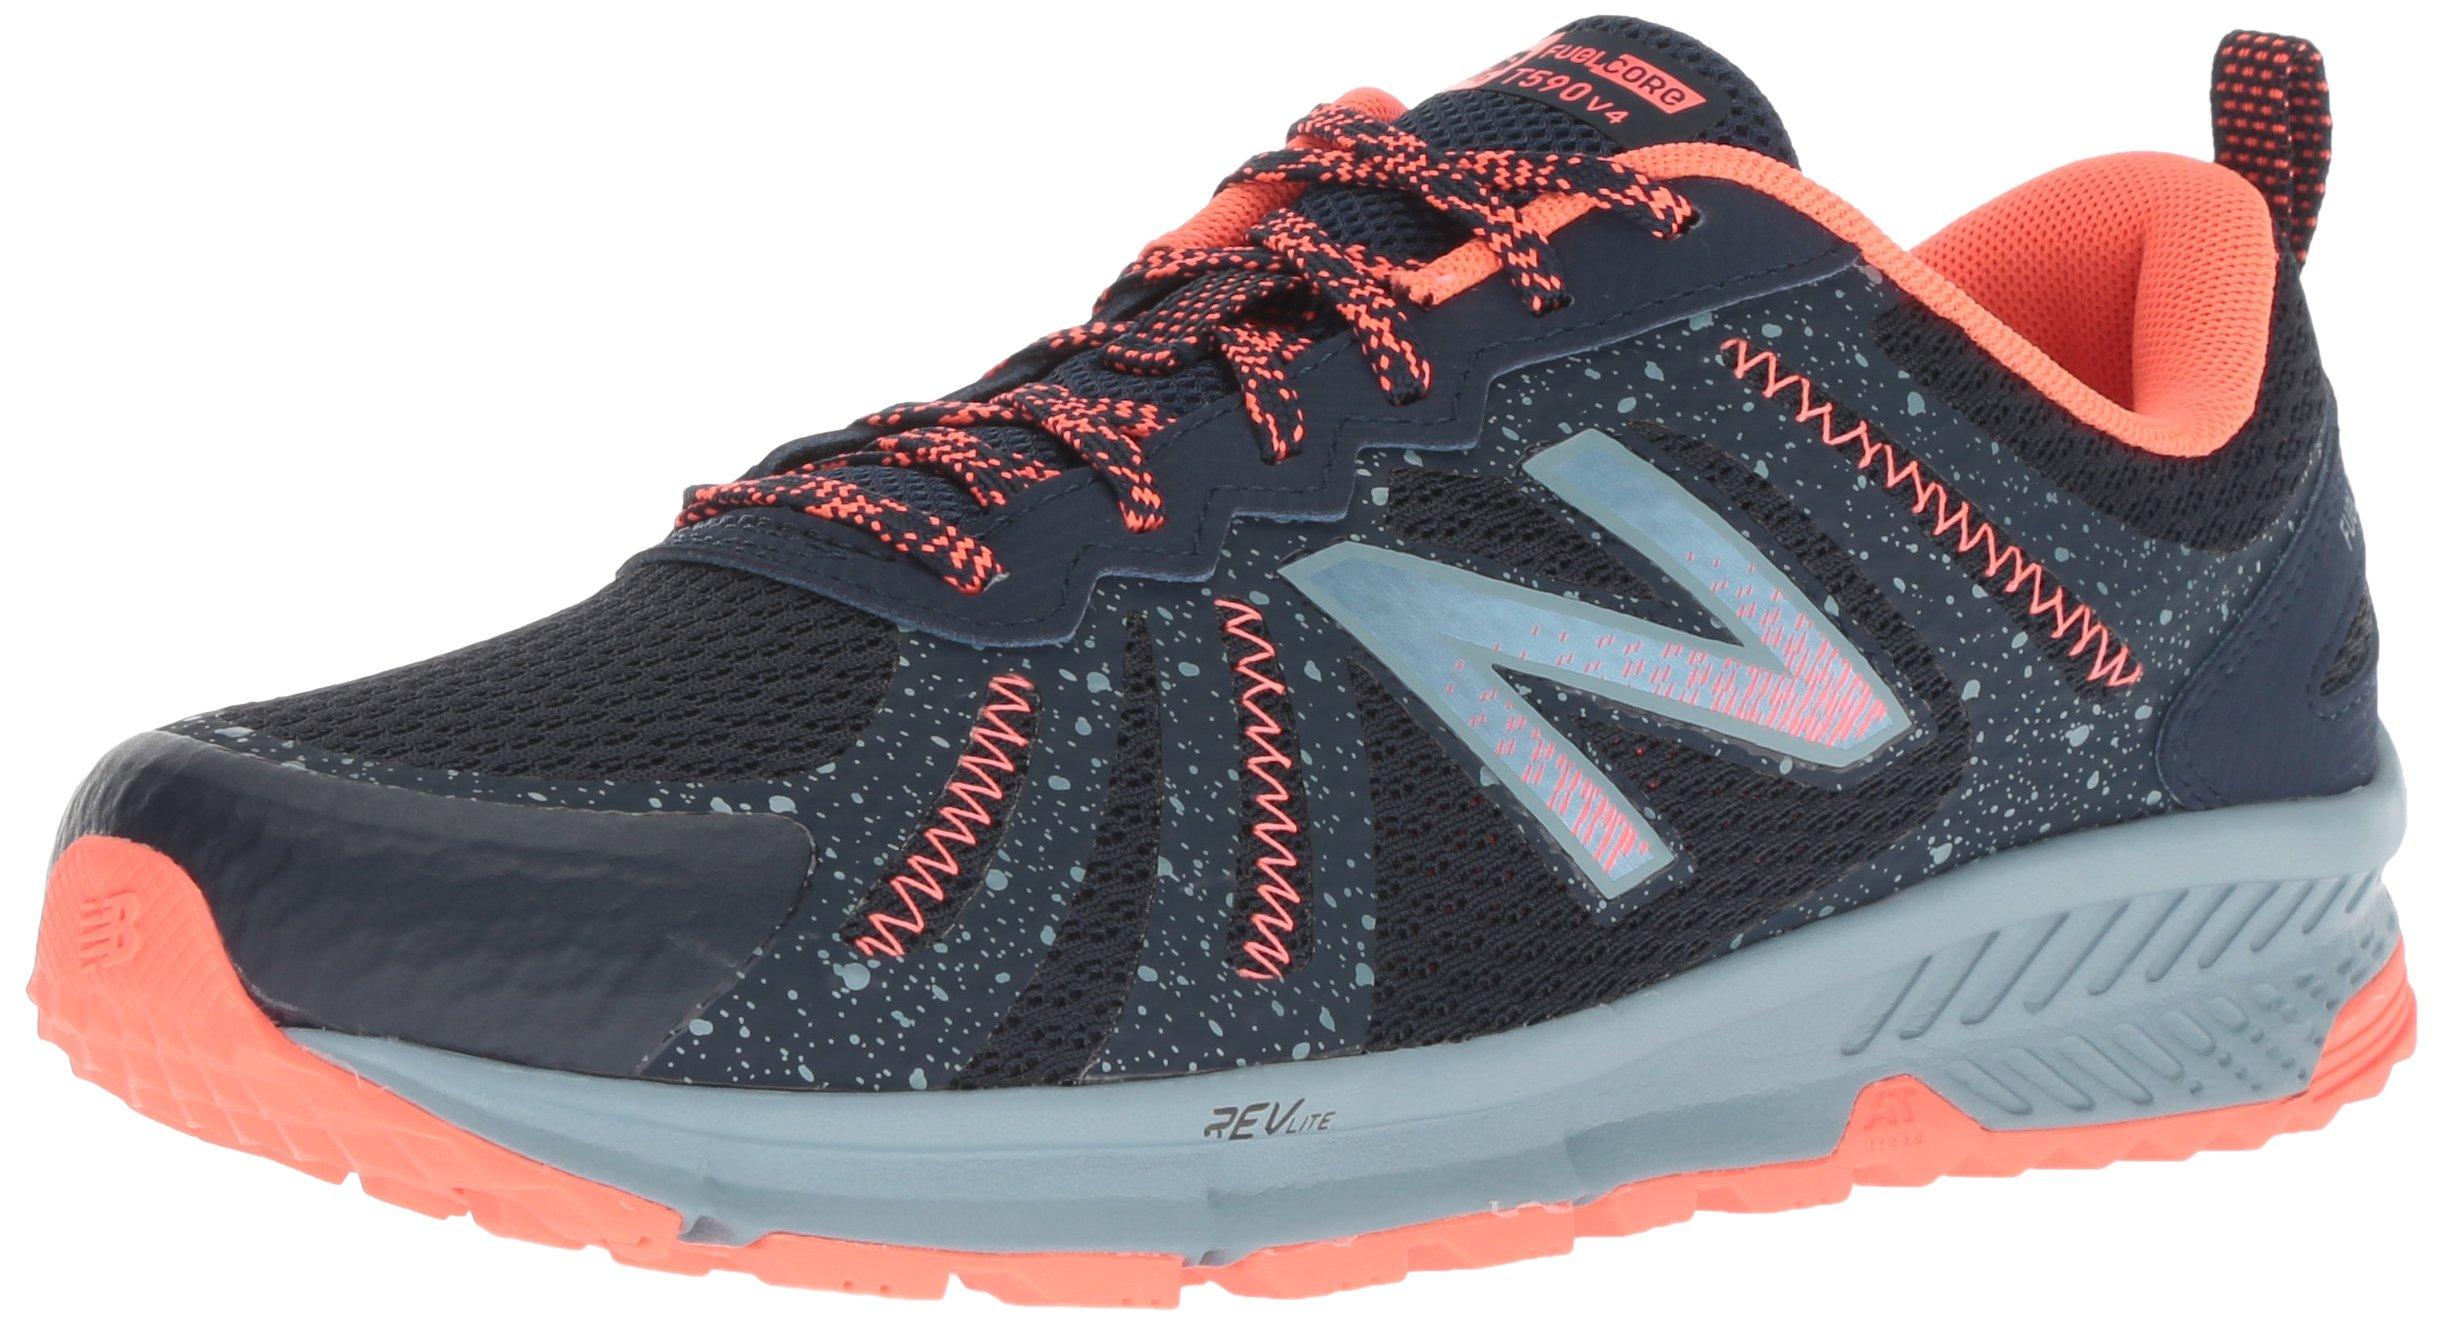 New Balance Women's 590v4 FuelCore Trail Running Shoe, Galaxy, 5 B US by New Balance (Image #1)